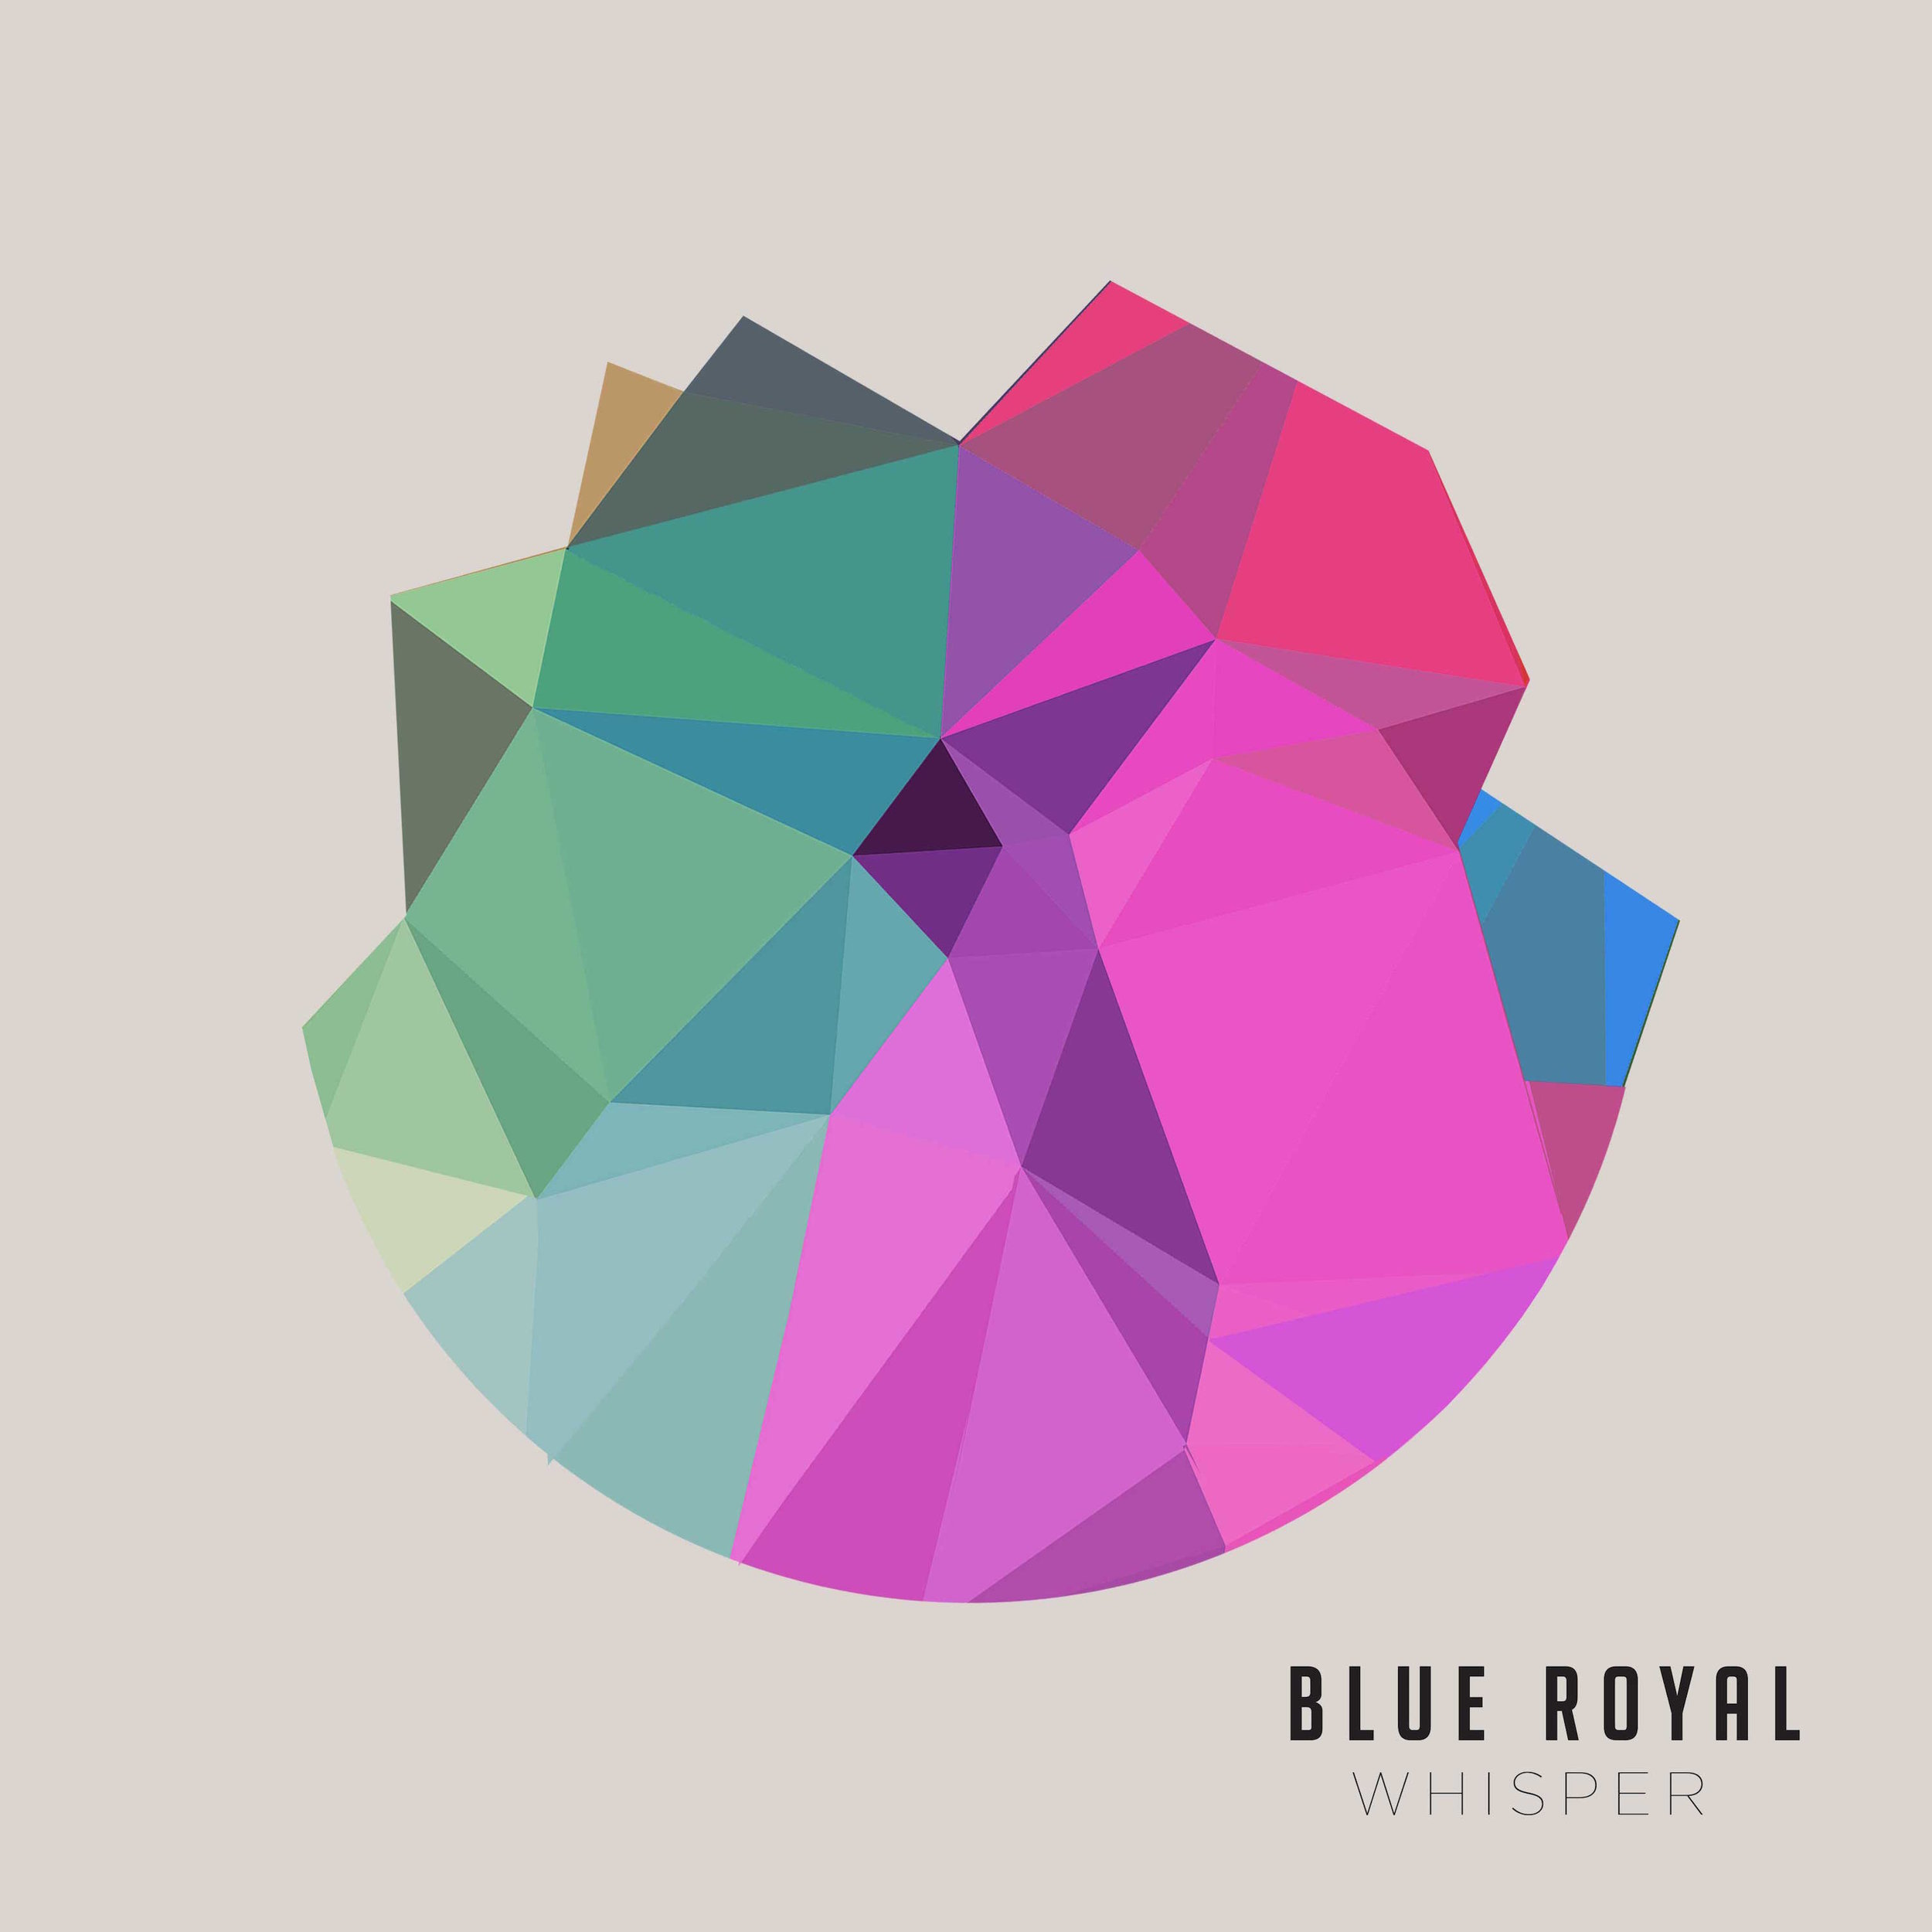 BlueRoyal.jpg